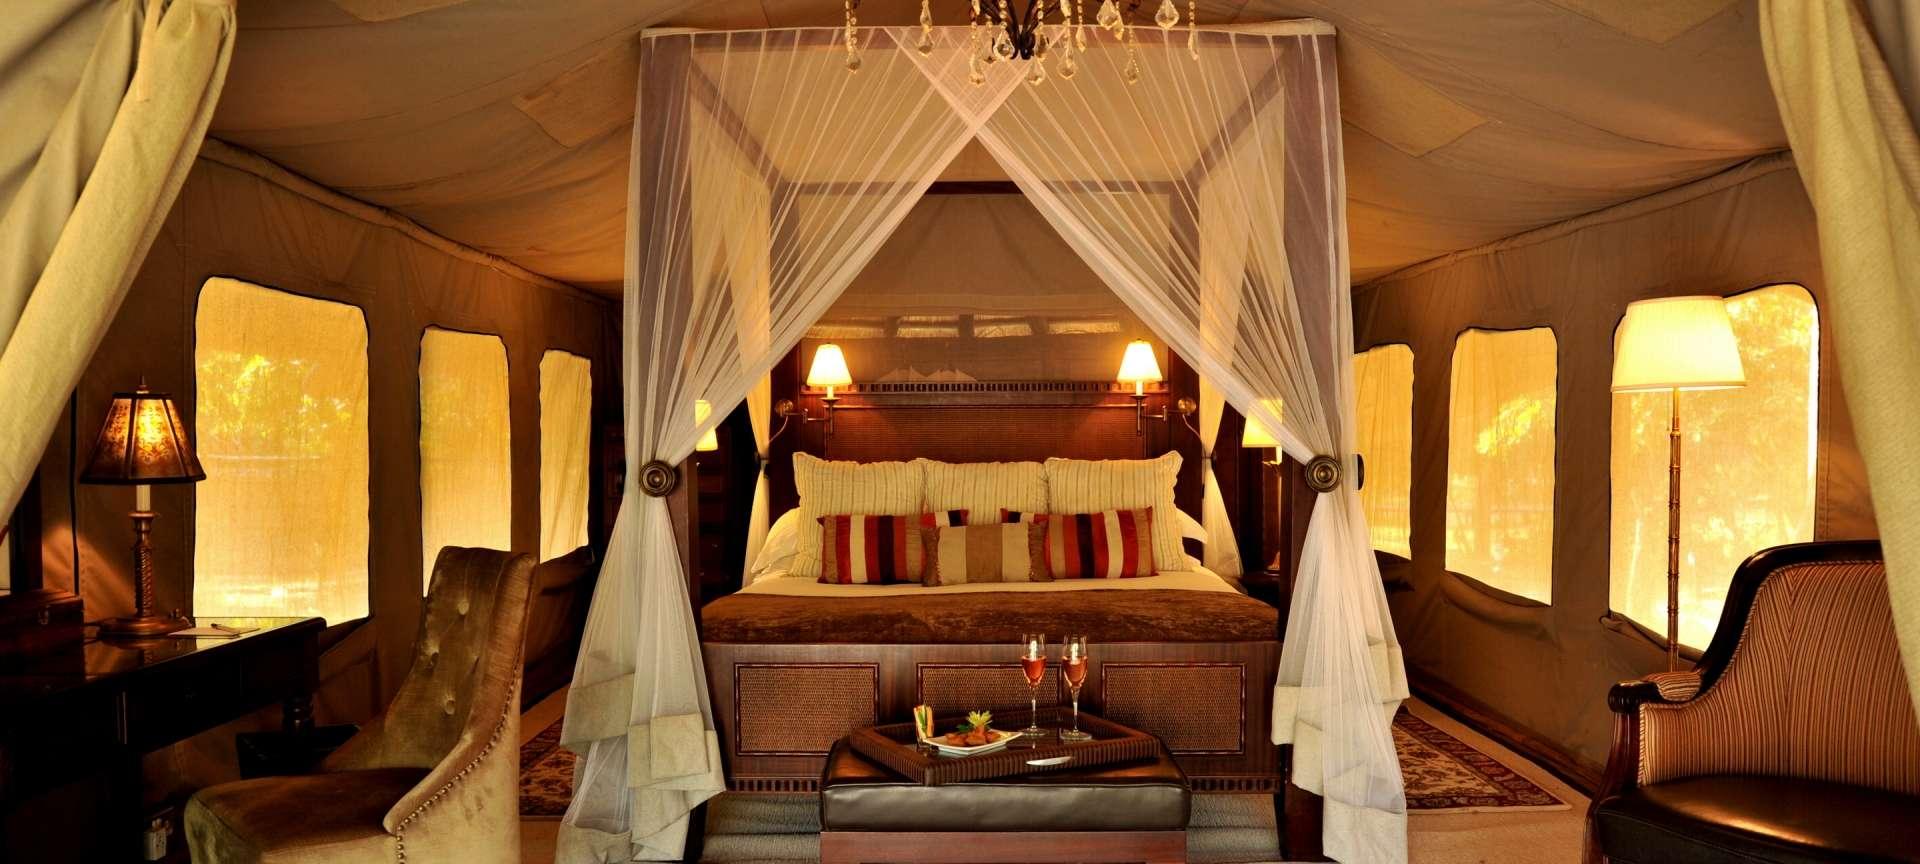 Selous Serena Camp Discover Africa Safaris